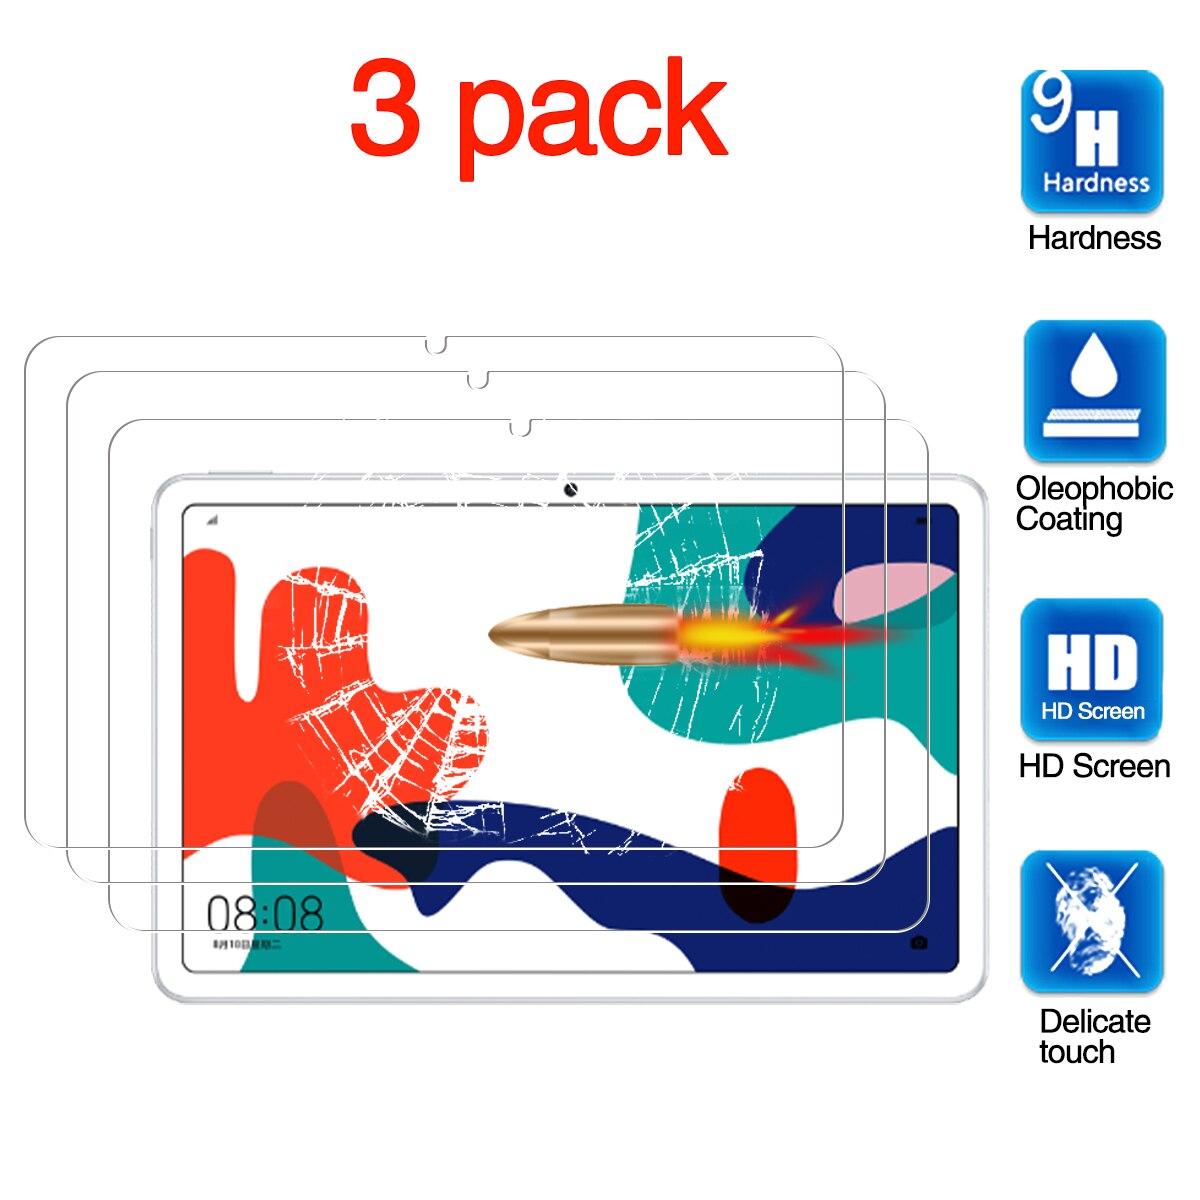 Protector de pantalla para Huawei MatePad, película protectora para Tablet, vidrio templado antiarañazos para Huawei MatePad (10,4 pulgadas)